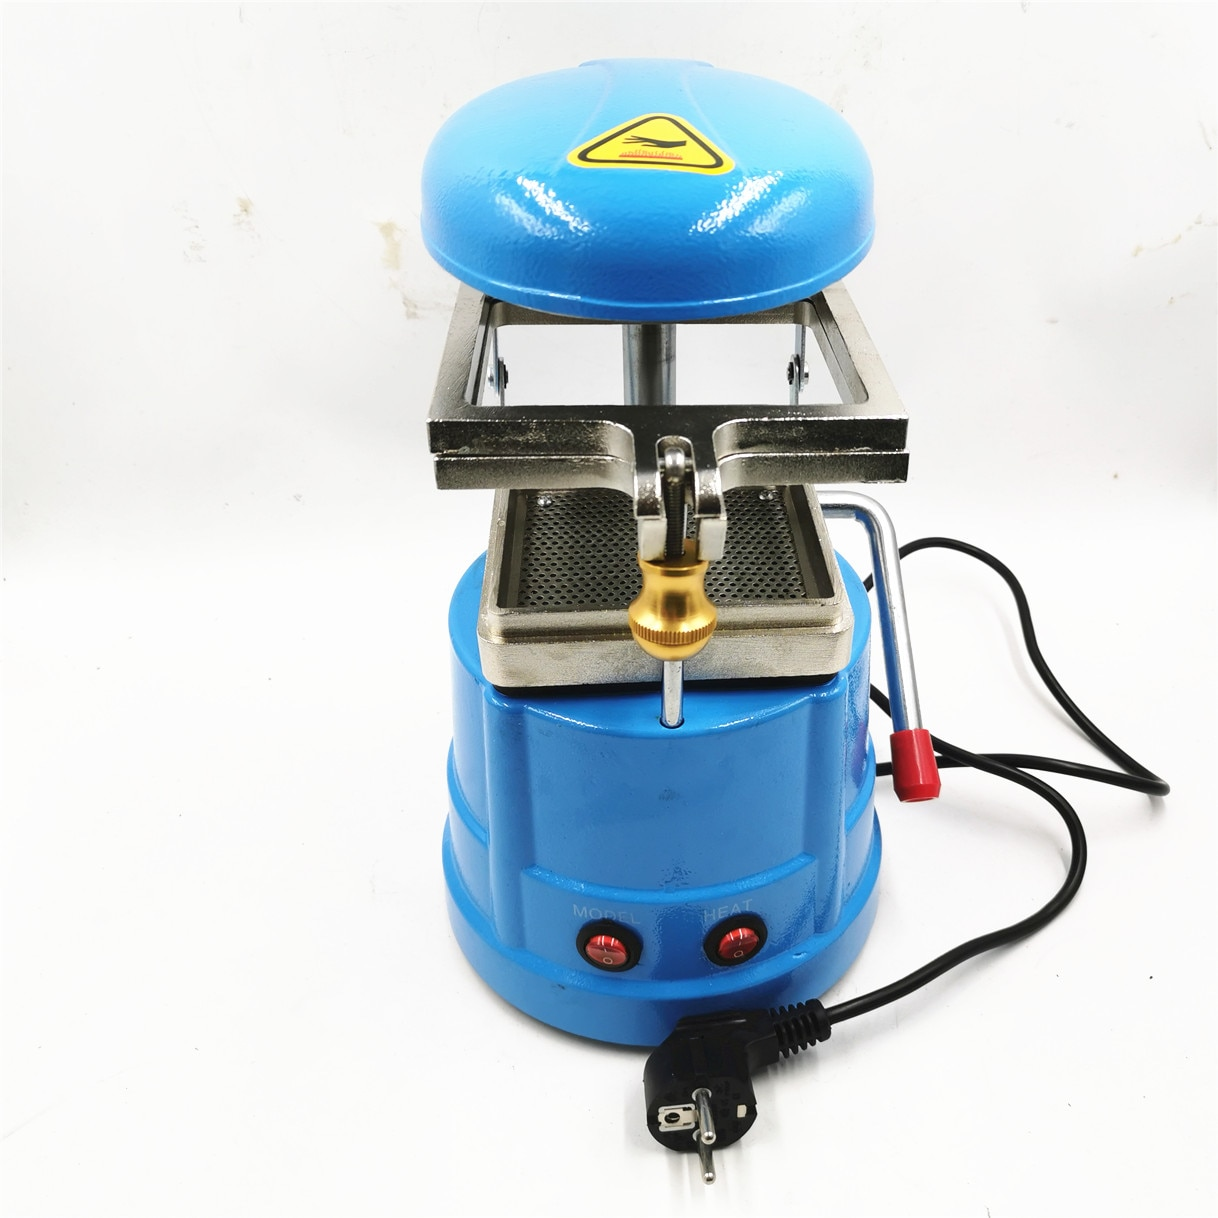 Dental Laminator Dental Lab Equipment Small Dental Vacuum Former Vacuum Forming And Molding Machine Oral Material Making Tool enlarge